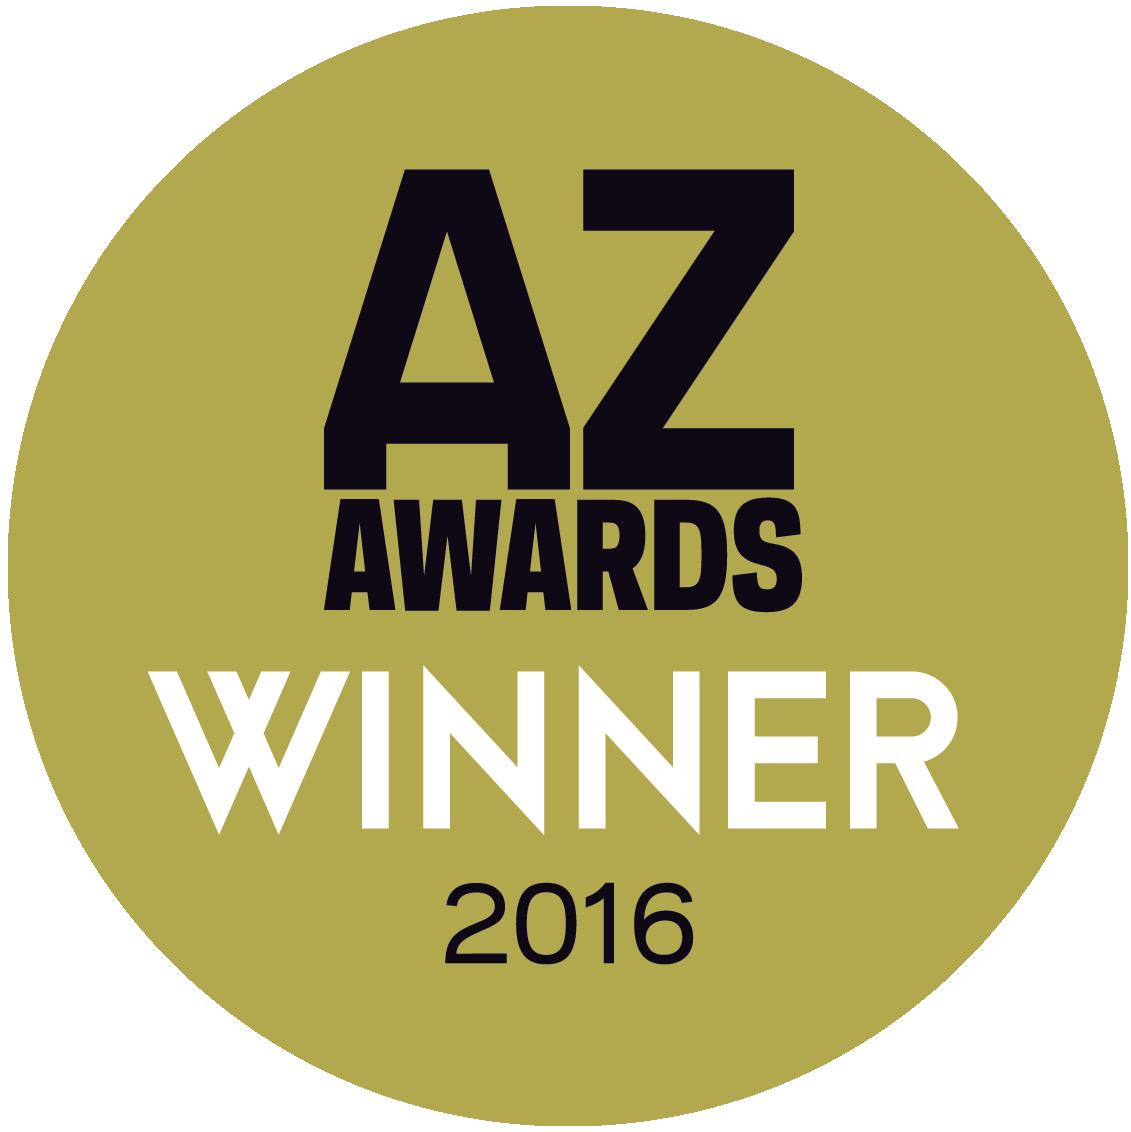 Az awards winner 2016